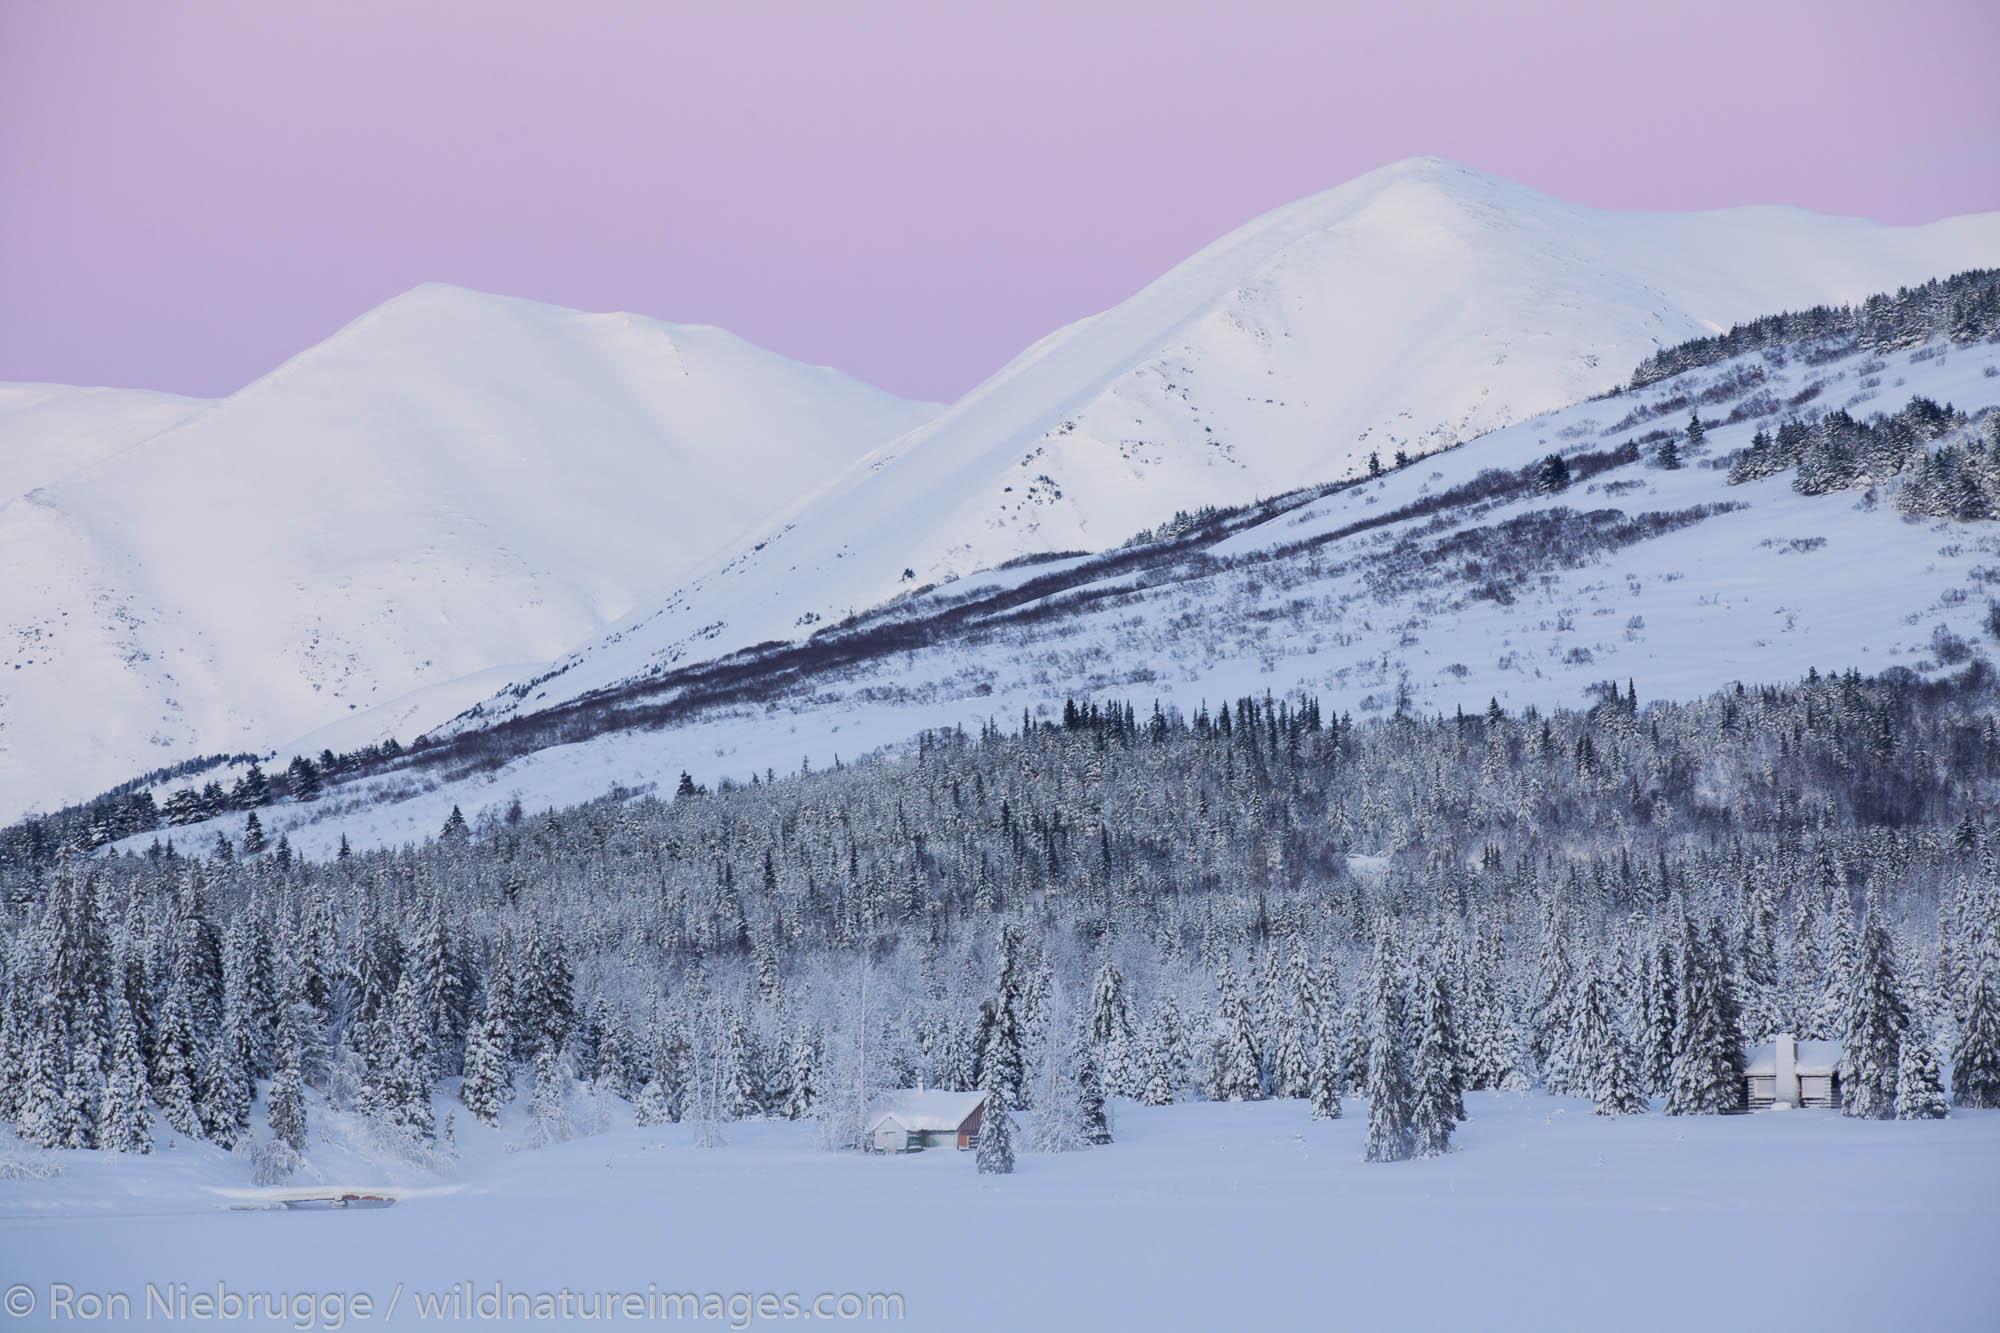 Cabins on Lower Summit Lake, Chugach National Forest, Alaska.